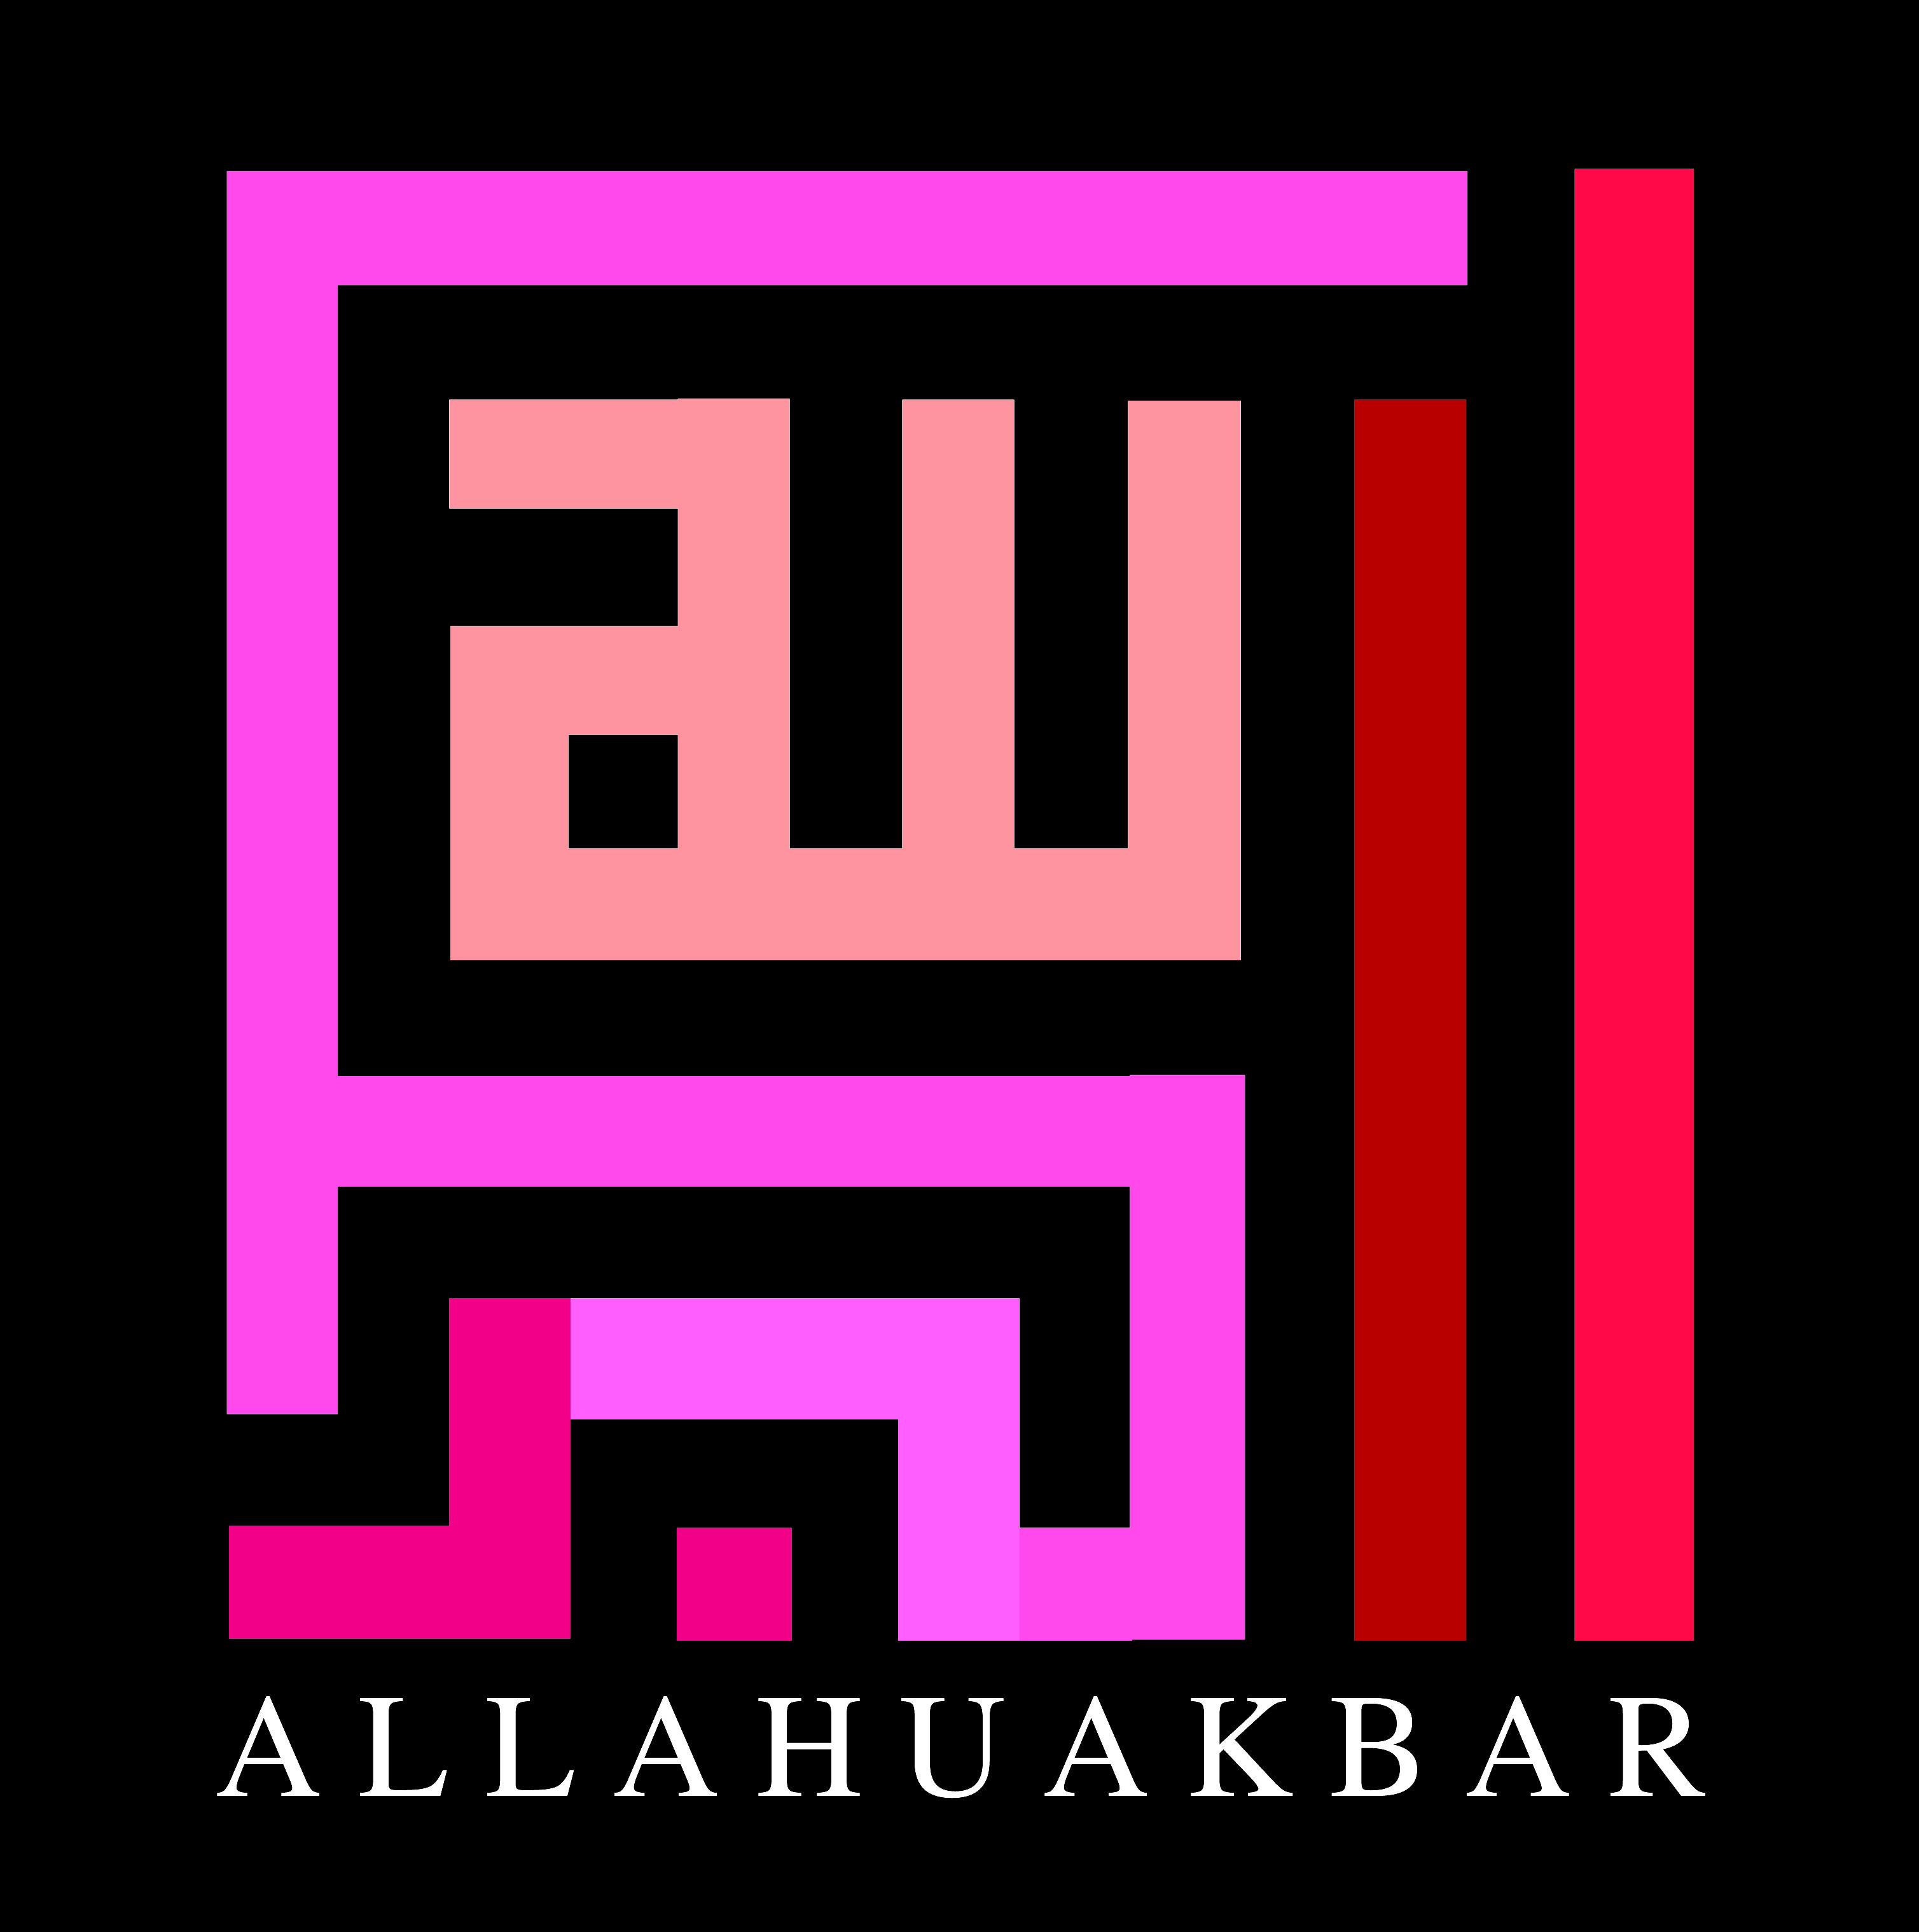 Allahuakbar kufi art pinterest calligraphy islamic